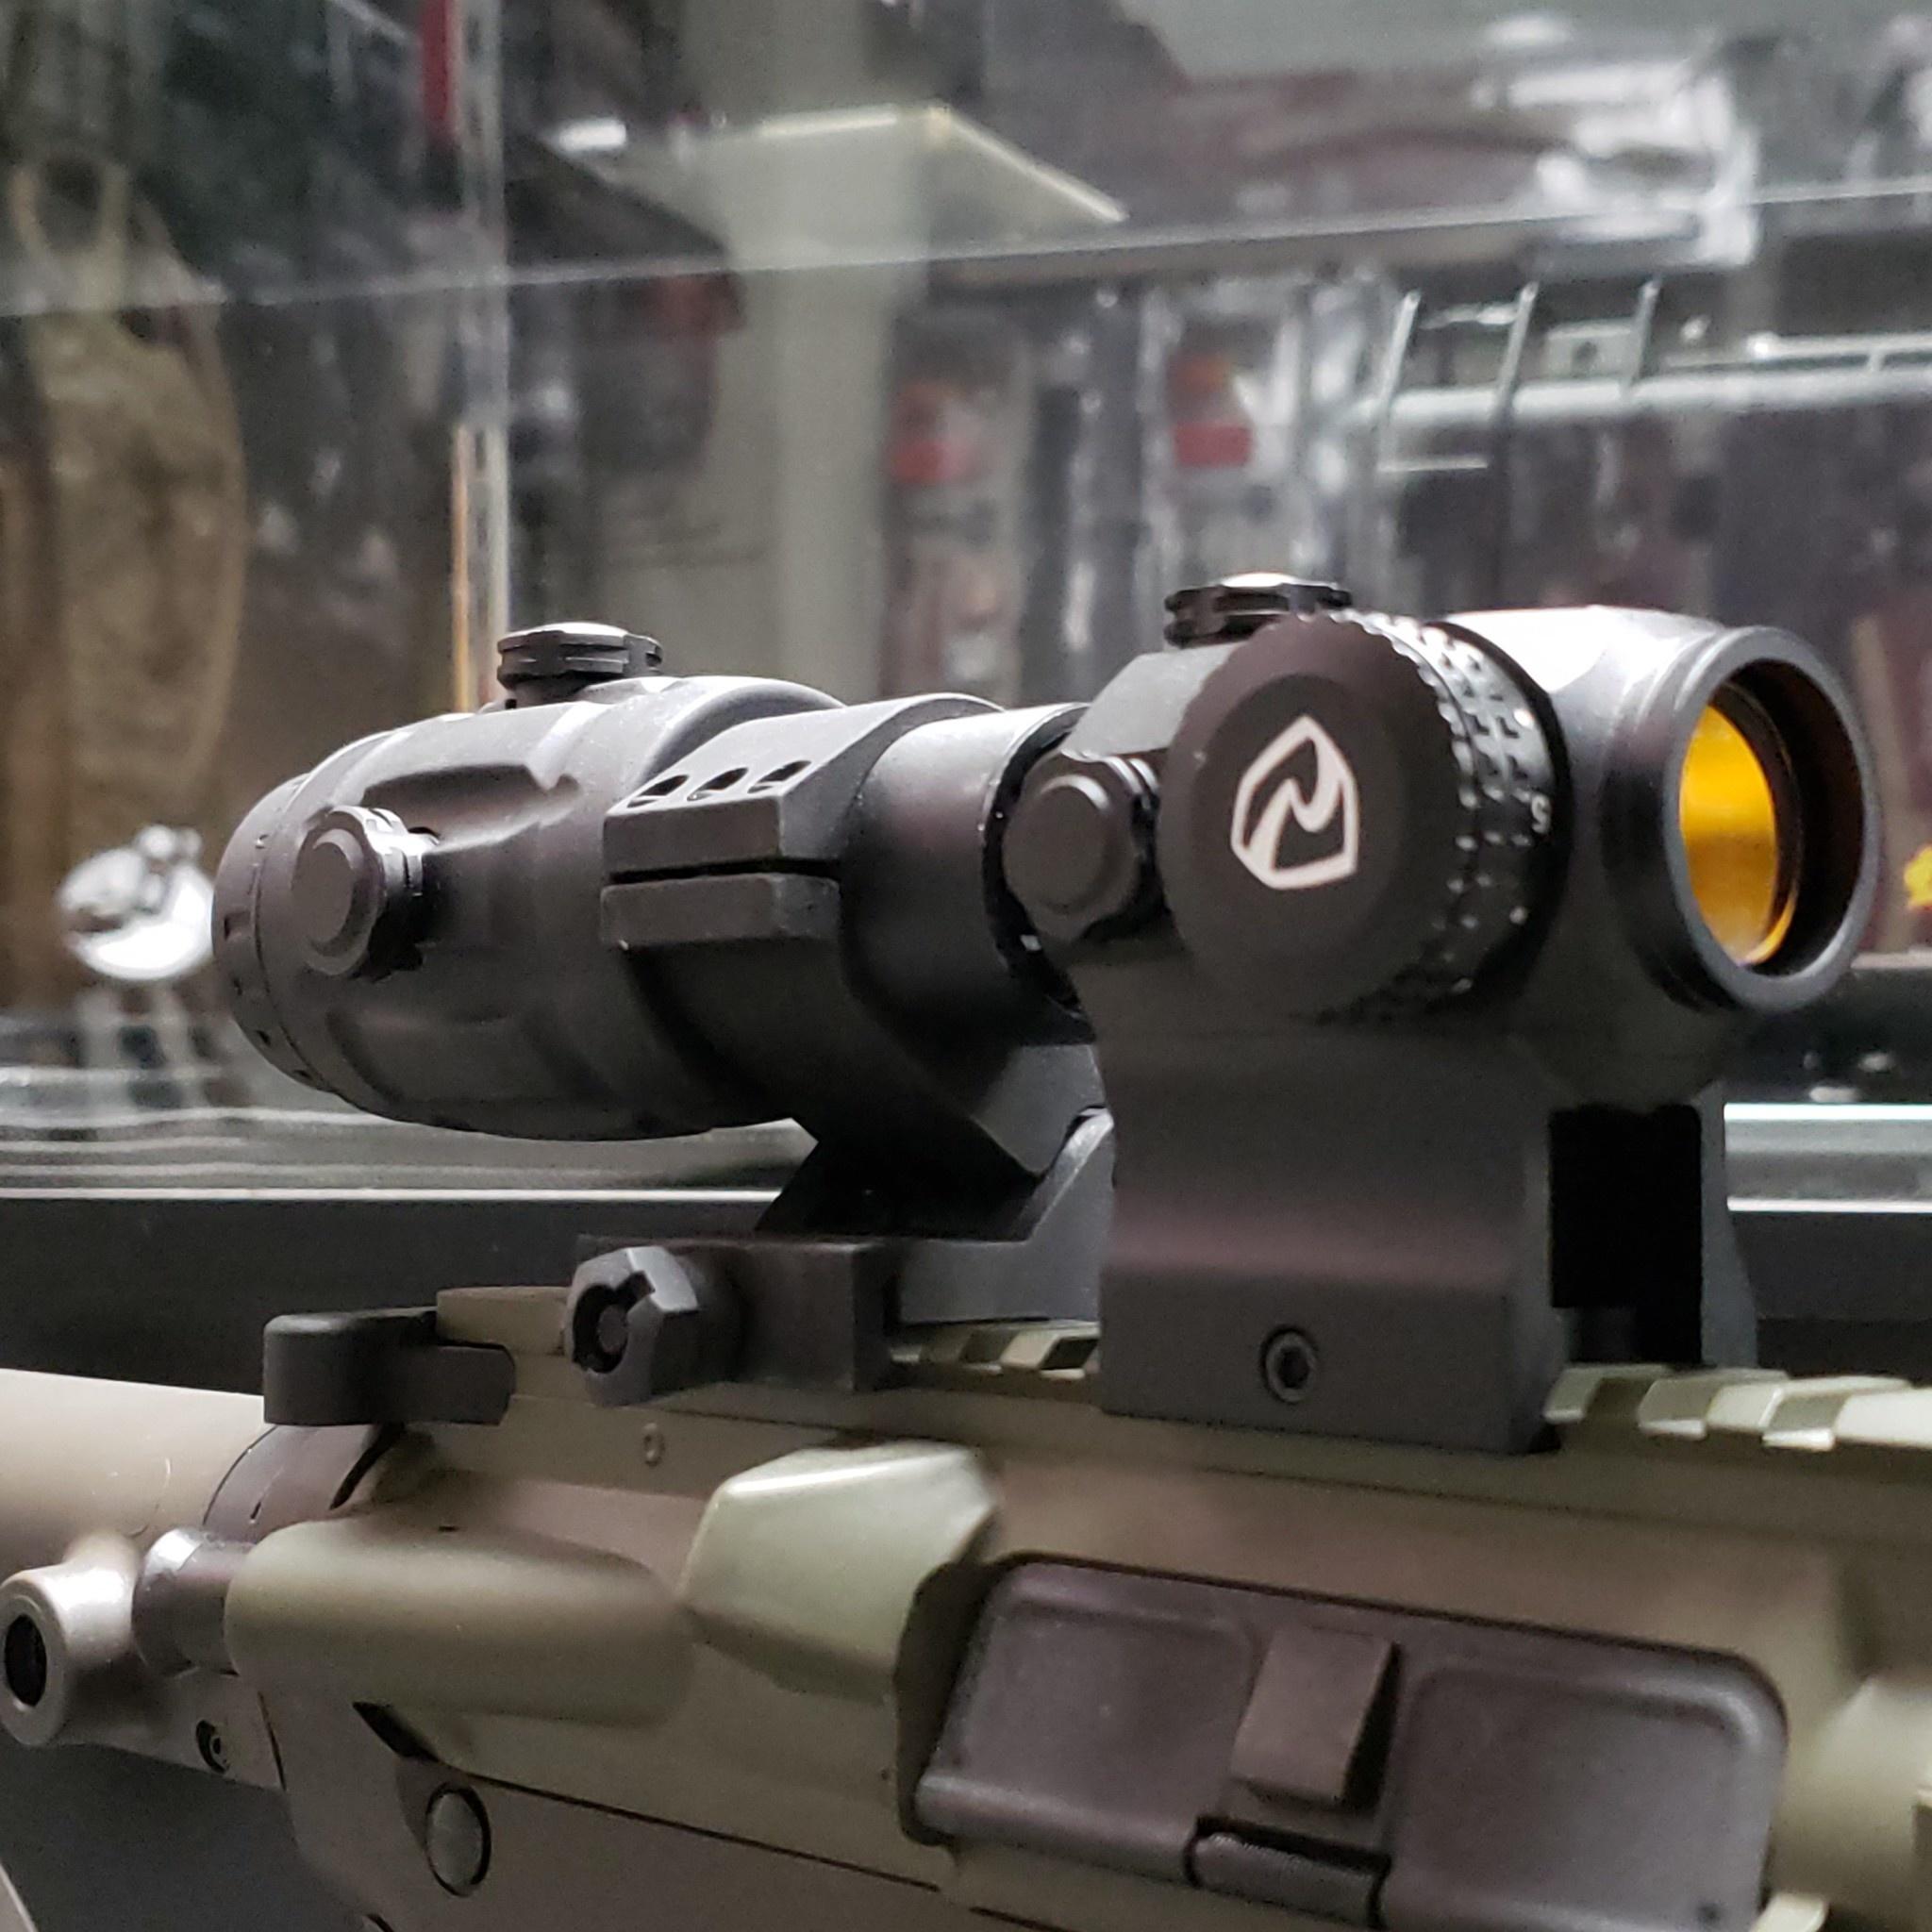 Riton RT-R Mod 3 Micro Red Dot with Riton RT-R 3x Magnifier